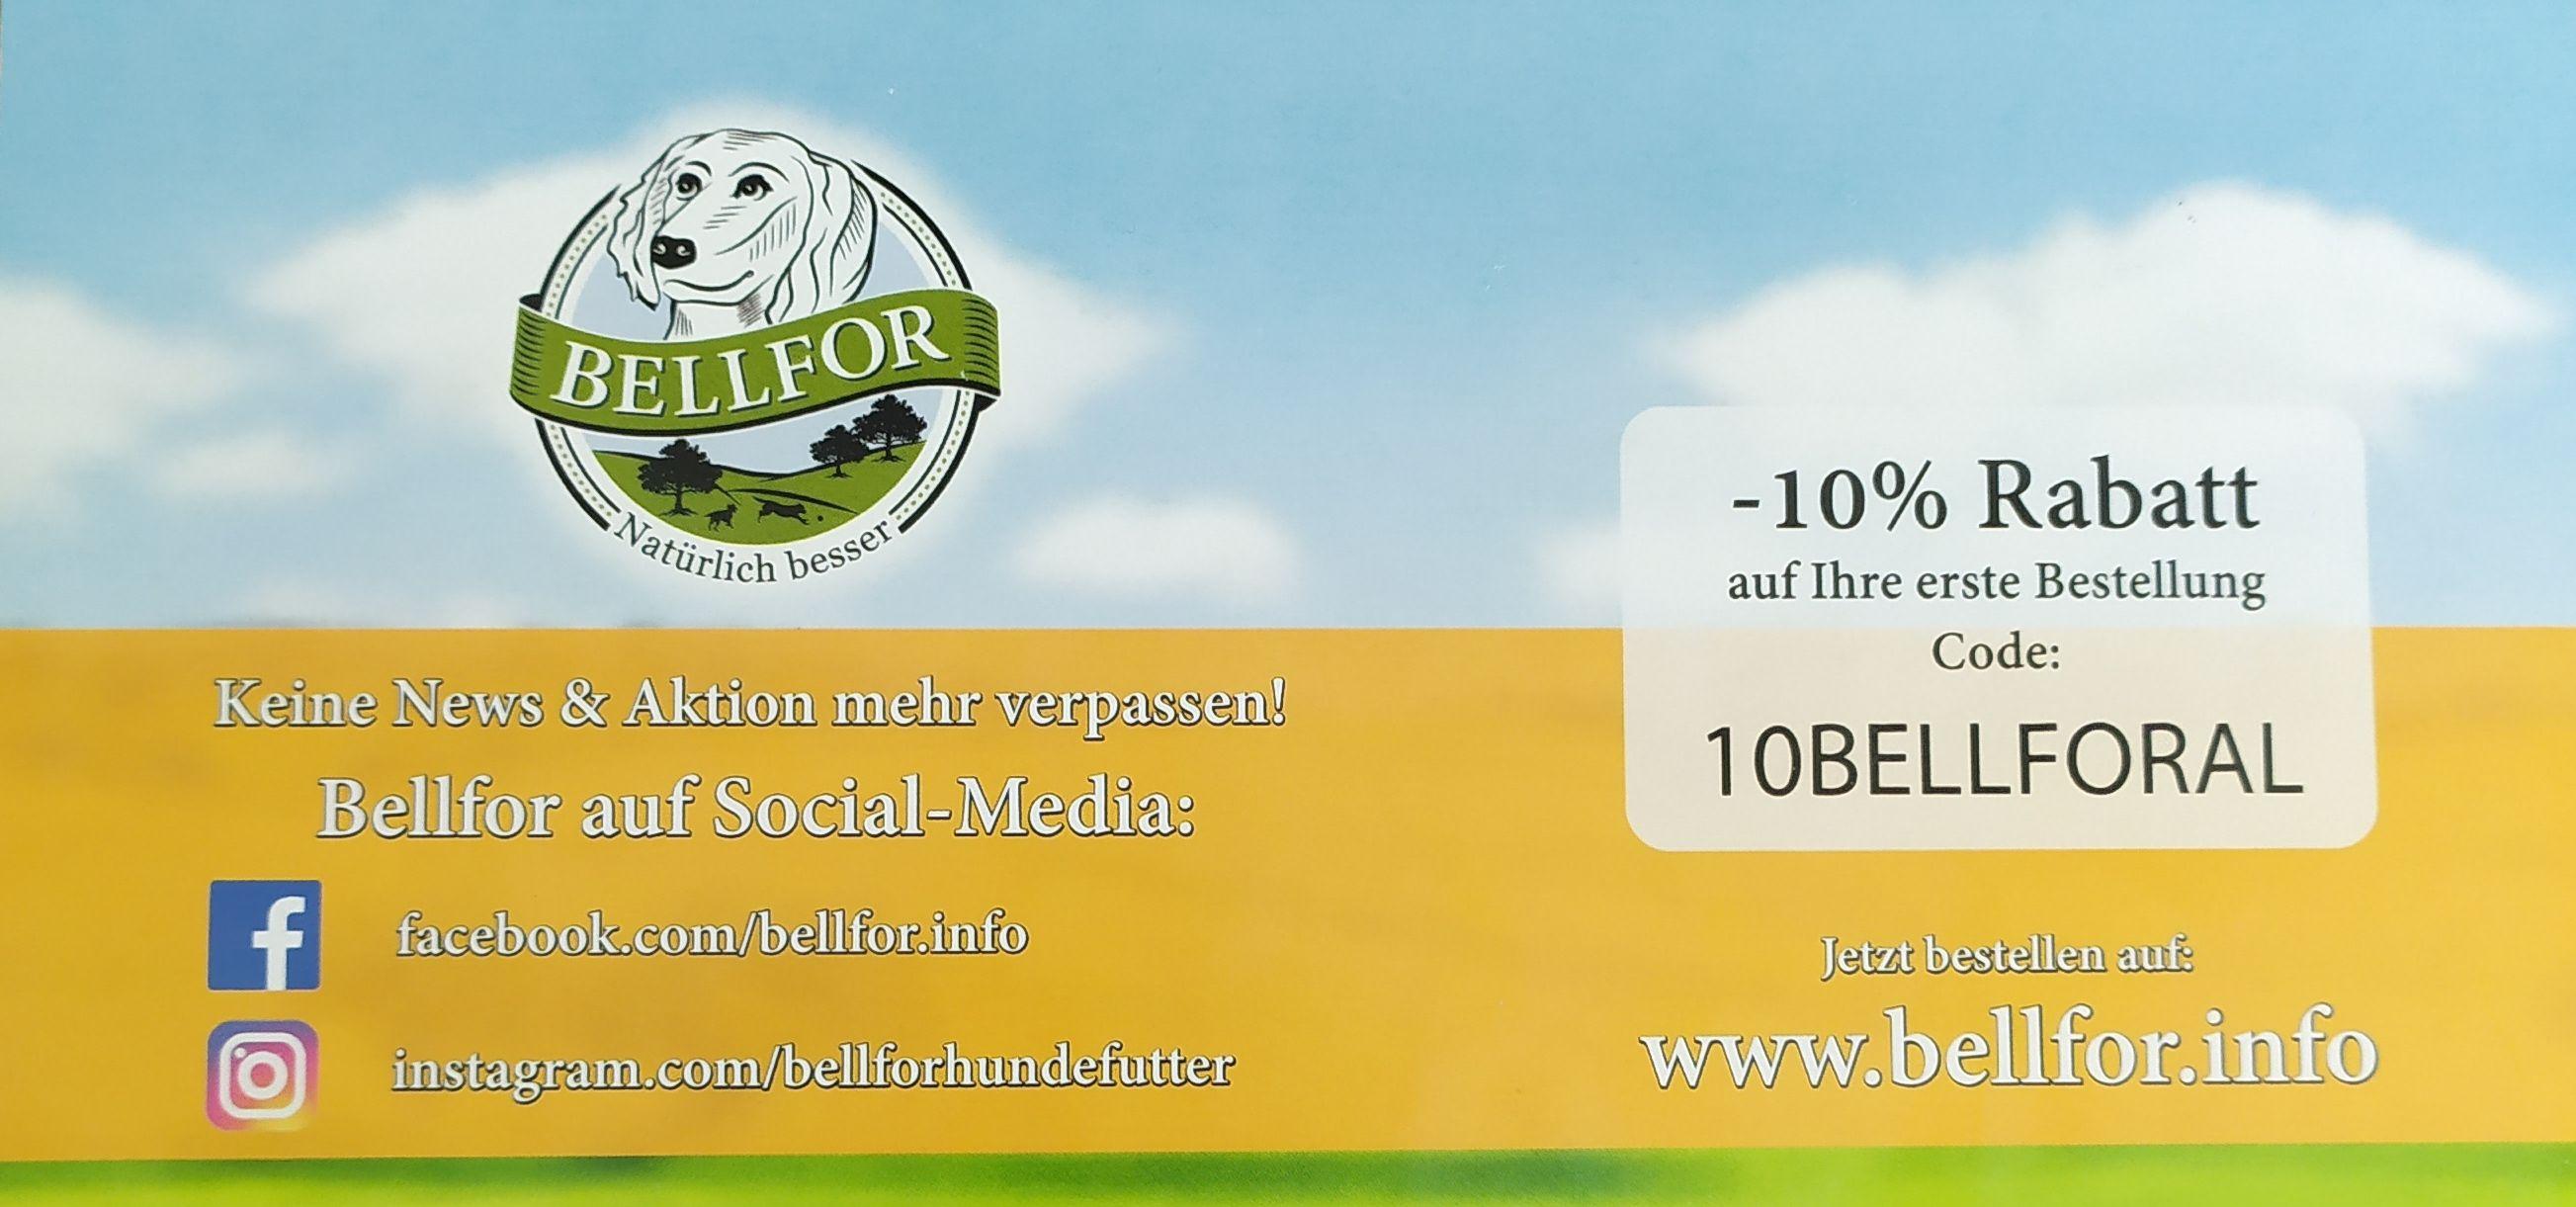 10% auf das gesamte Bellfor-Sortiment -u.a. getreidefreies Hundefutter